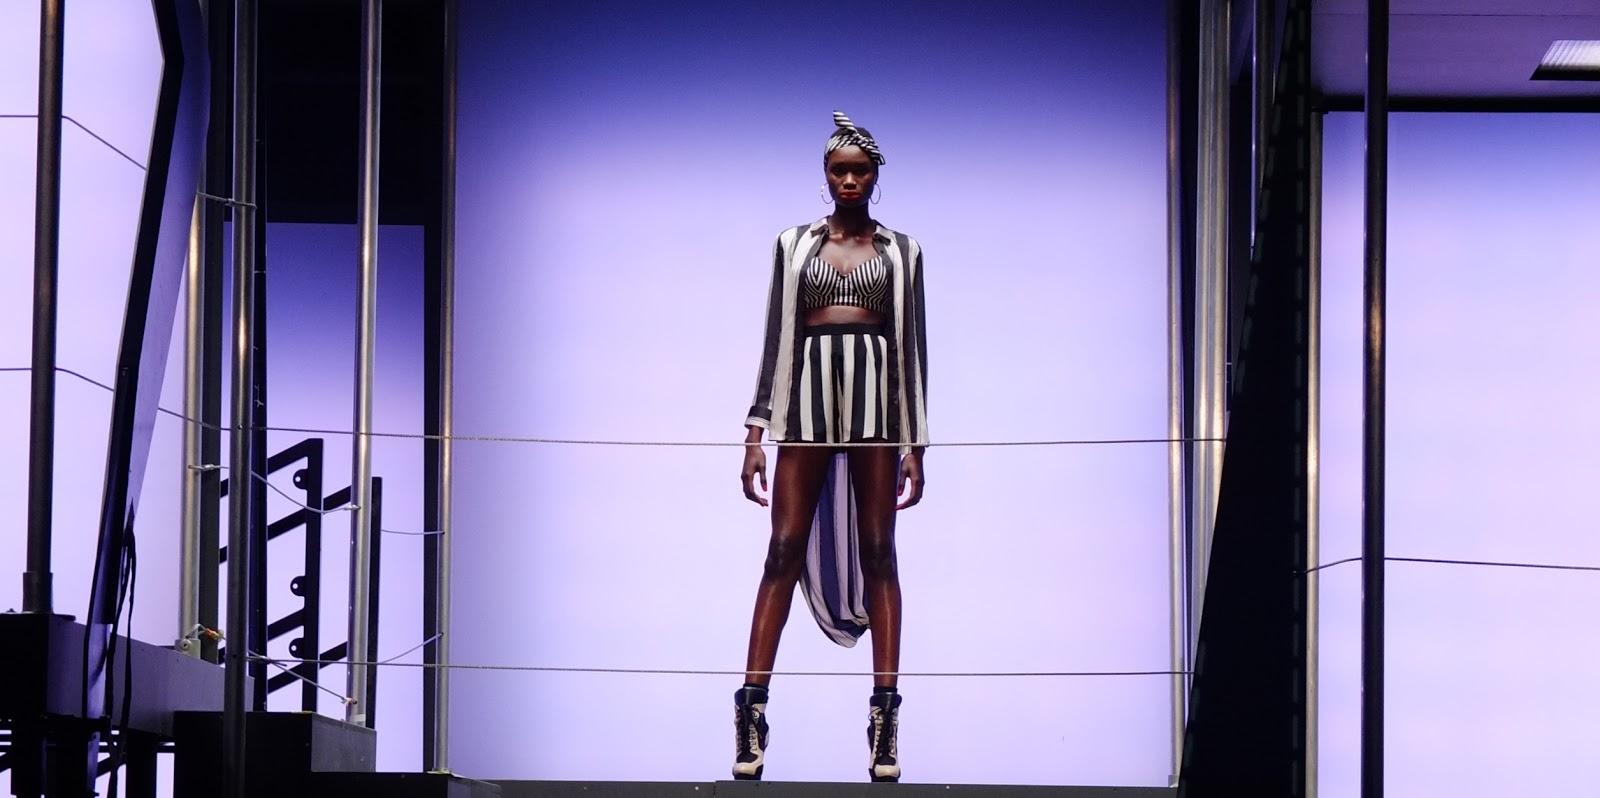 http://2.bp.blogspot.com/-Pa9Yzr3LLTc/USilSVf8bpI/AAAAAAAAAXg/E-qNBI82K1M/s1600/Rihanna-river-island-fashion-show4.jpg